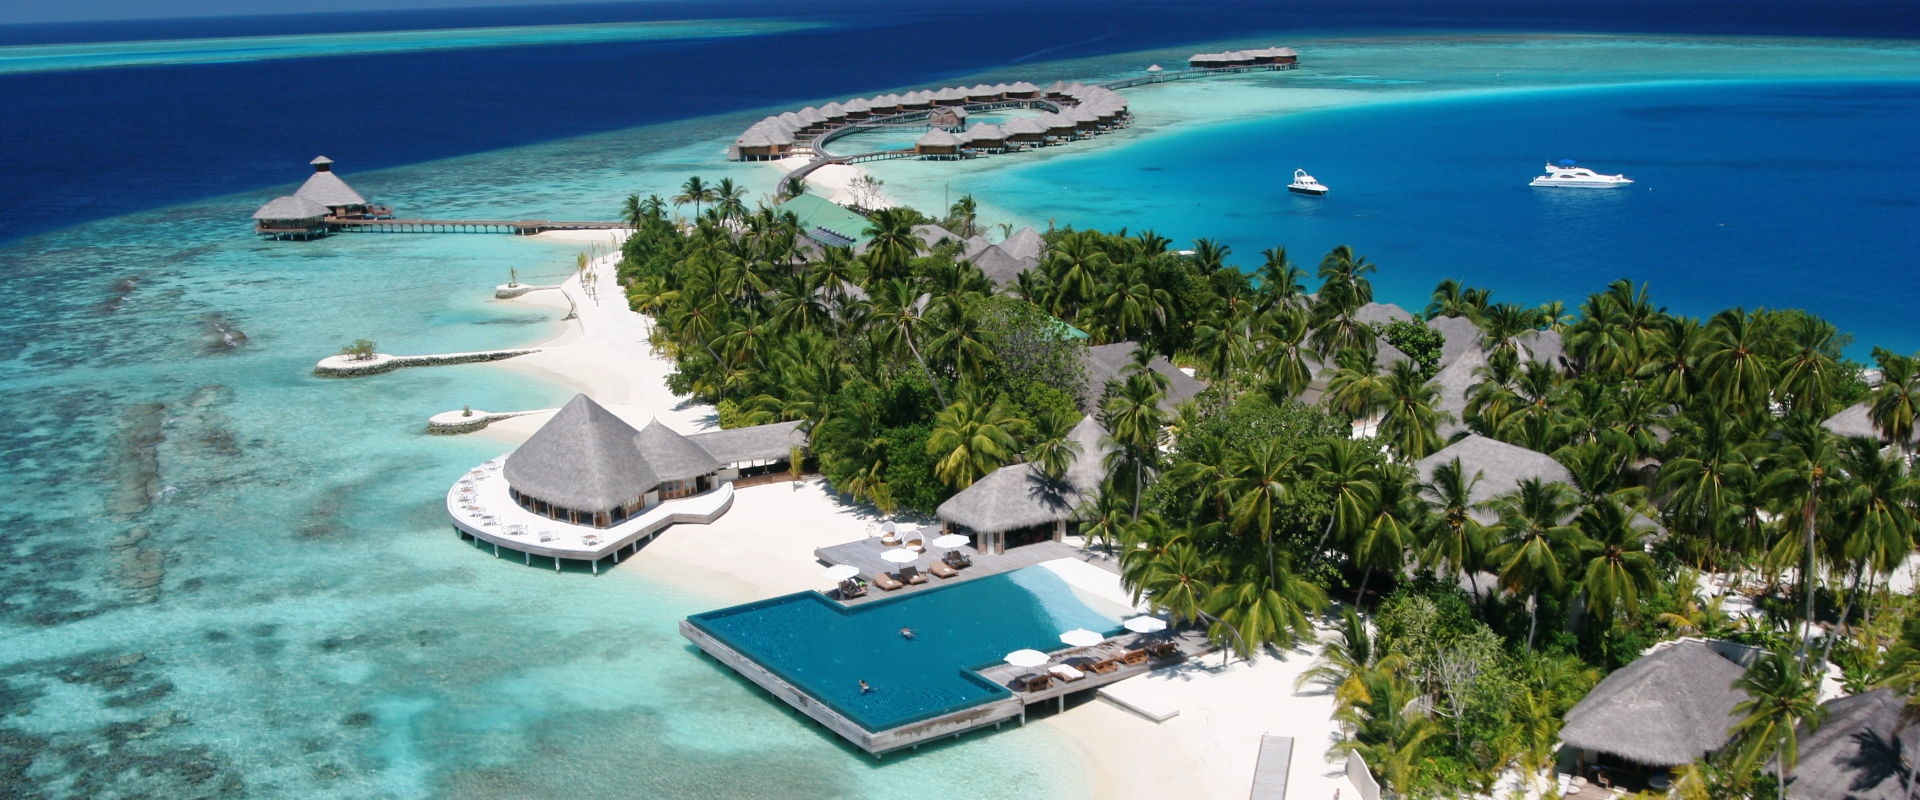 maldives8